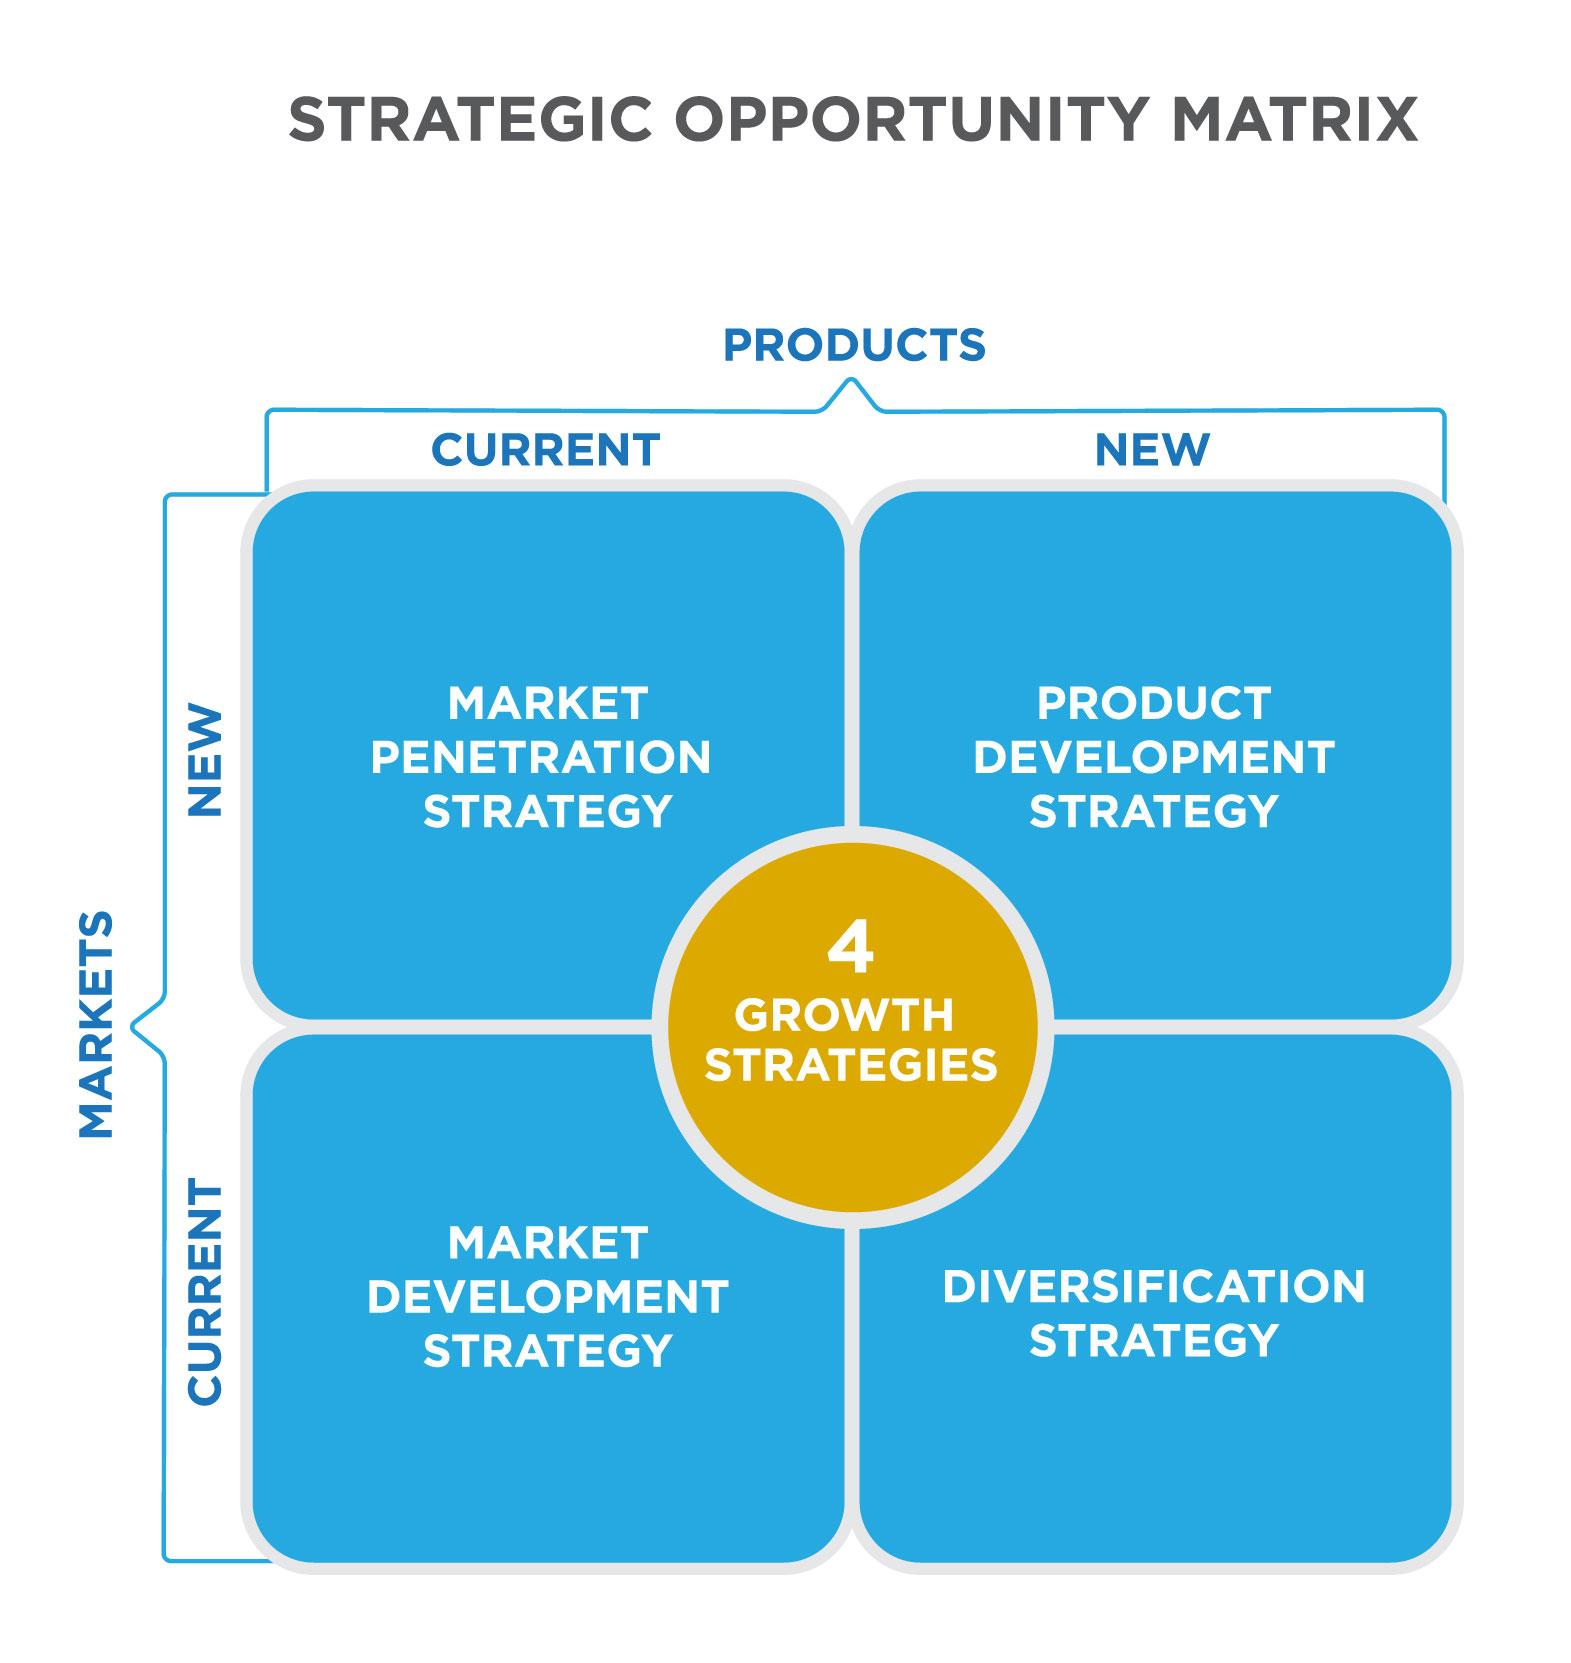 strategic planning framework diagram facial muscles unlabeled market diversification examples ac fan motor wiring